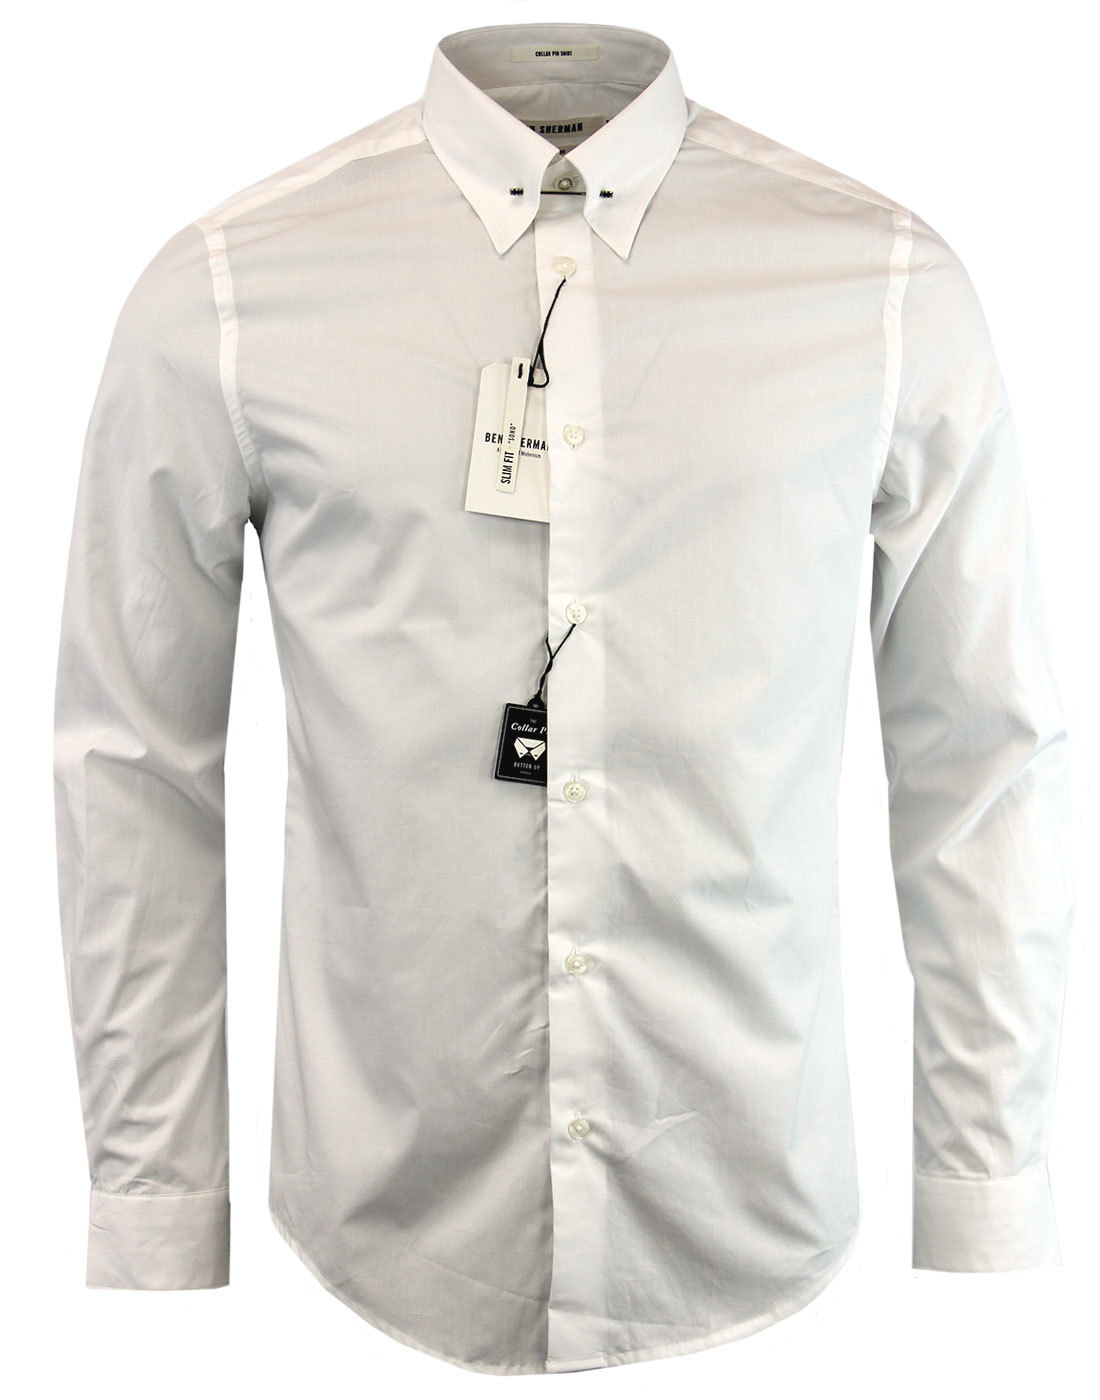 Ben Sherman Retro 1960s Mod Pin Collar Smart Dress Shirt In White